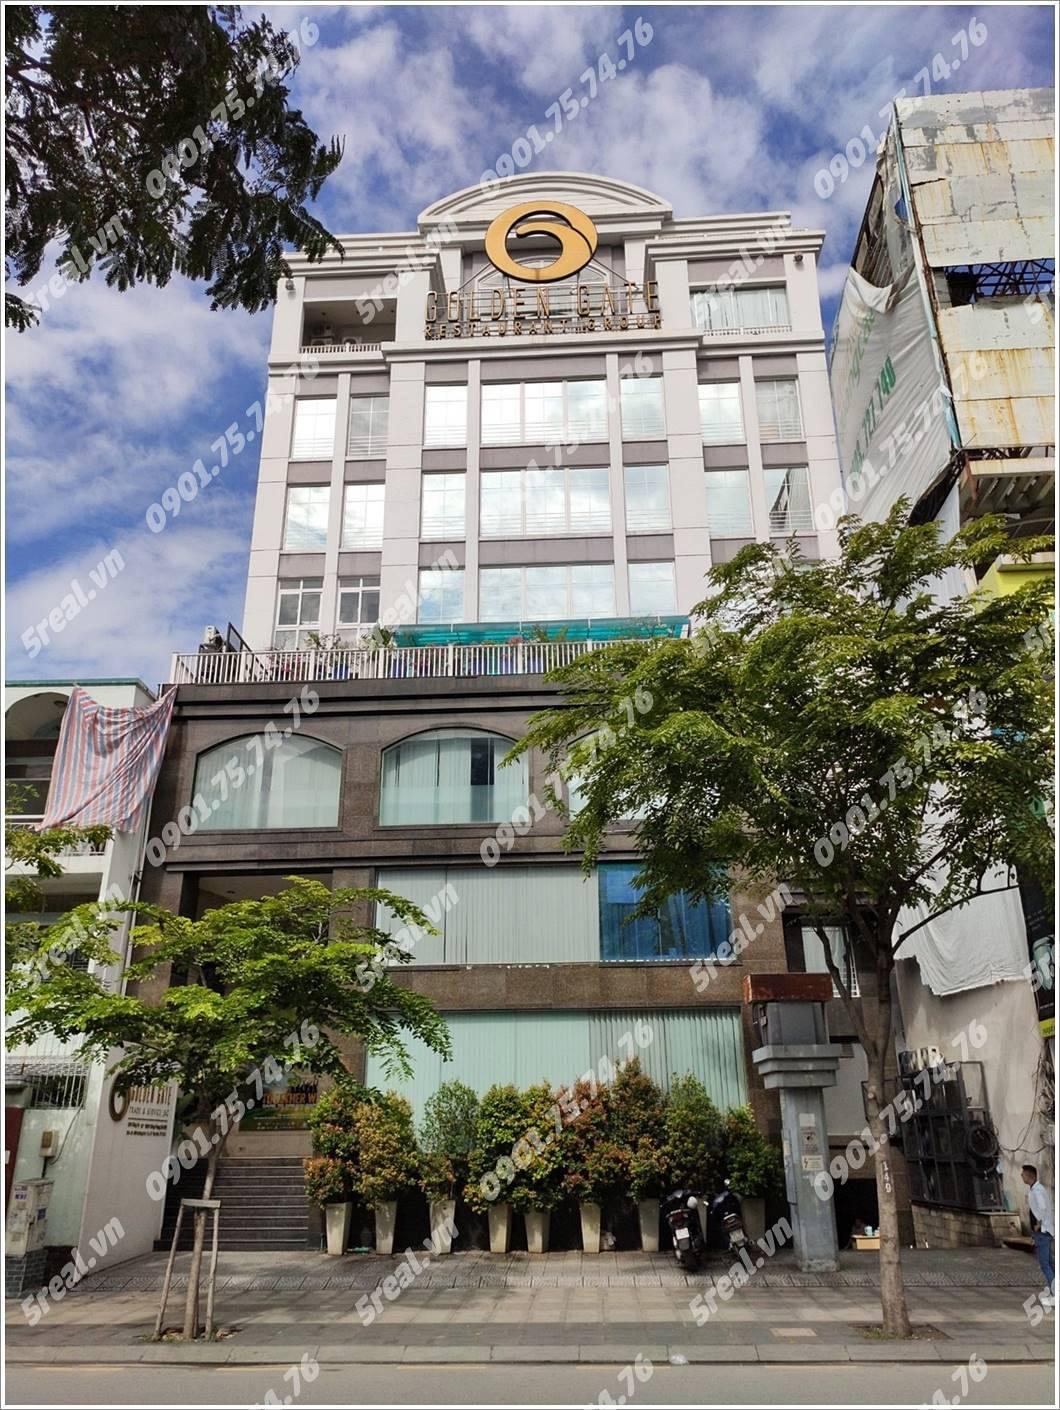 hhp-building-truong-son-quan-tan-binh-van-phong-cho-thue-5real.vn-01